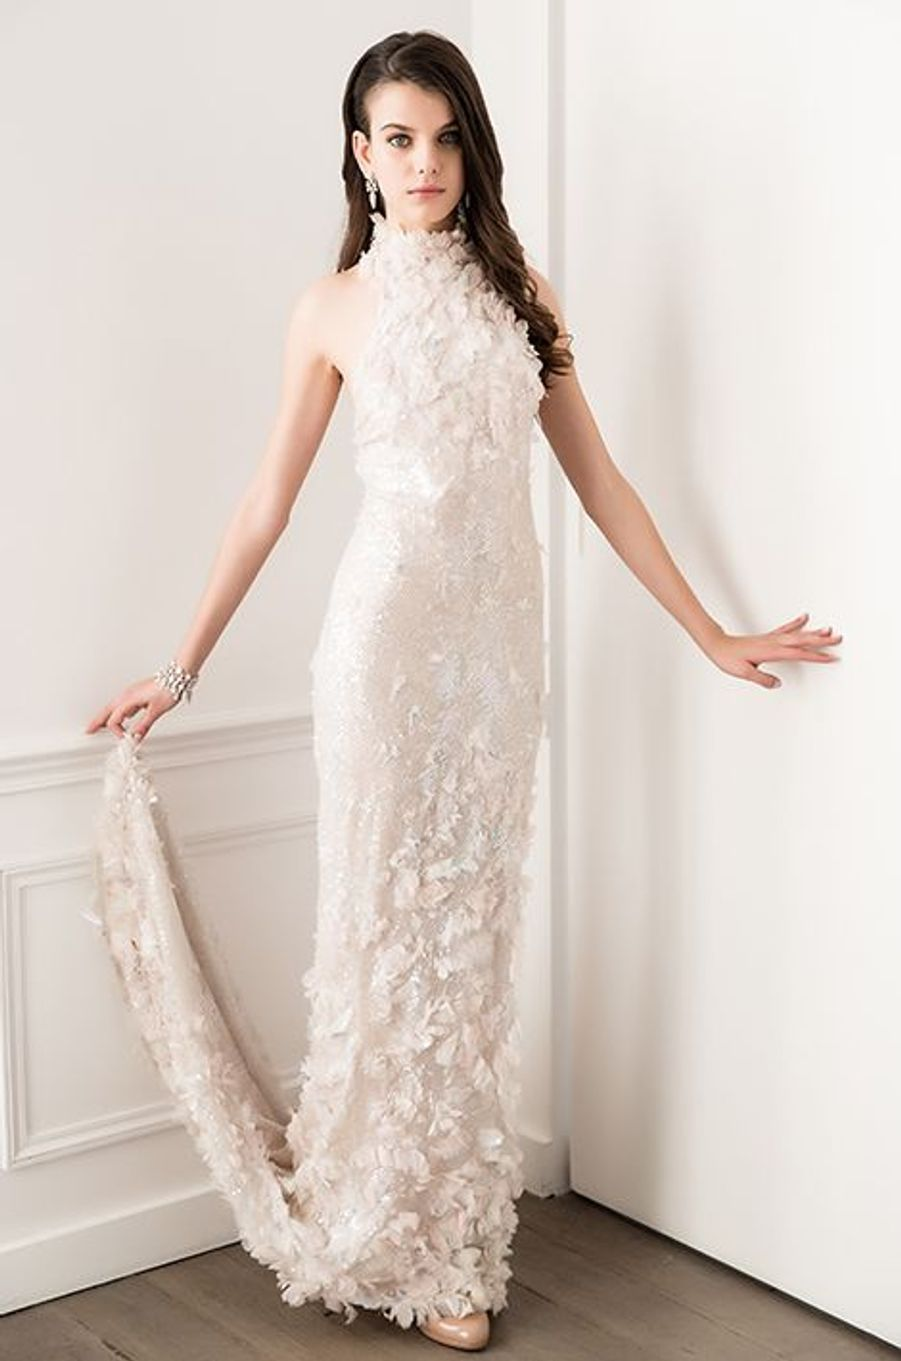 Sonia Ben Ammar (France) en robe Chanel Haute-Couture, bijoux Payal New York